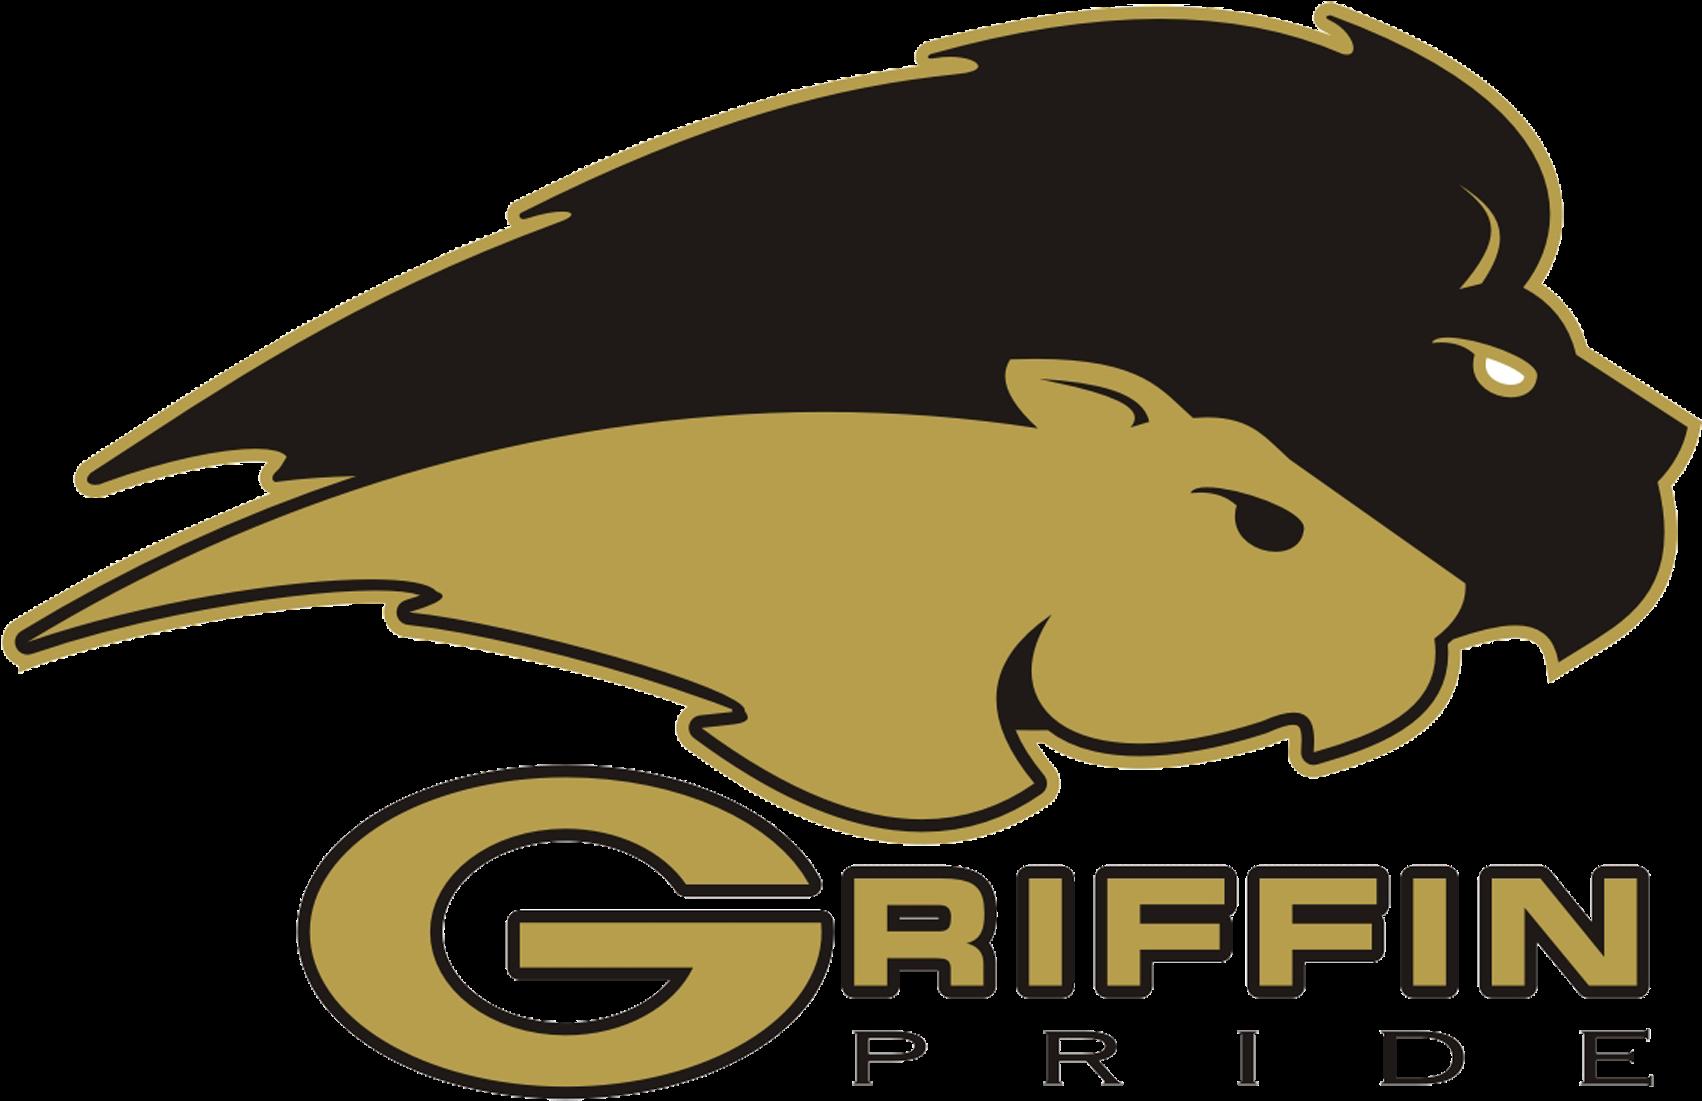 Transparent get dressed for school clipart - Griffin Middle School - Griffin Middle School The Colony